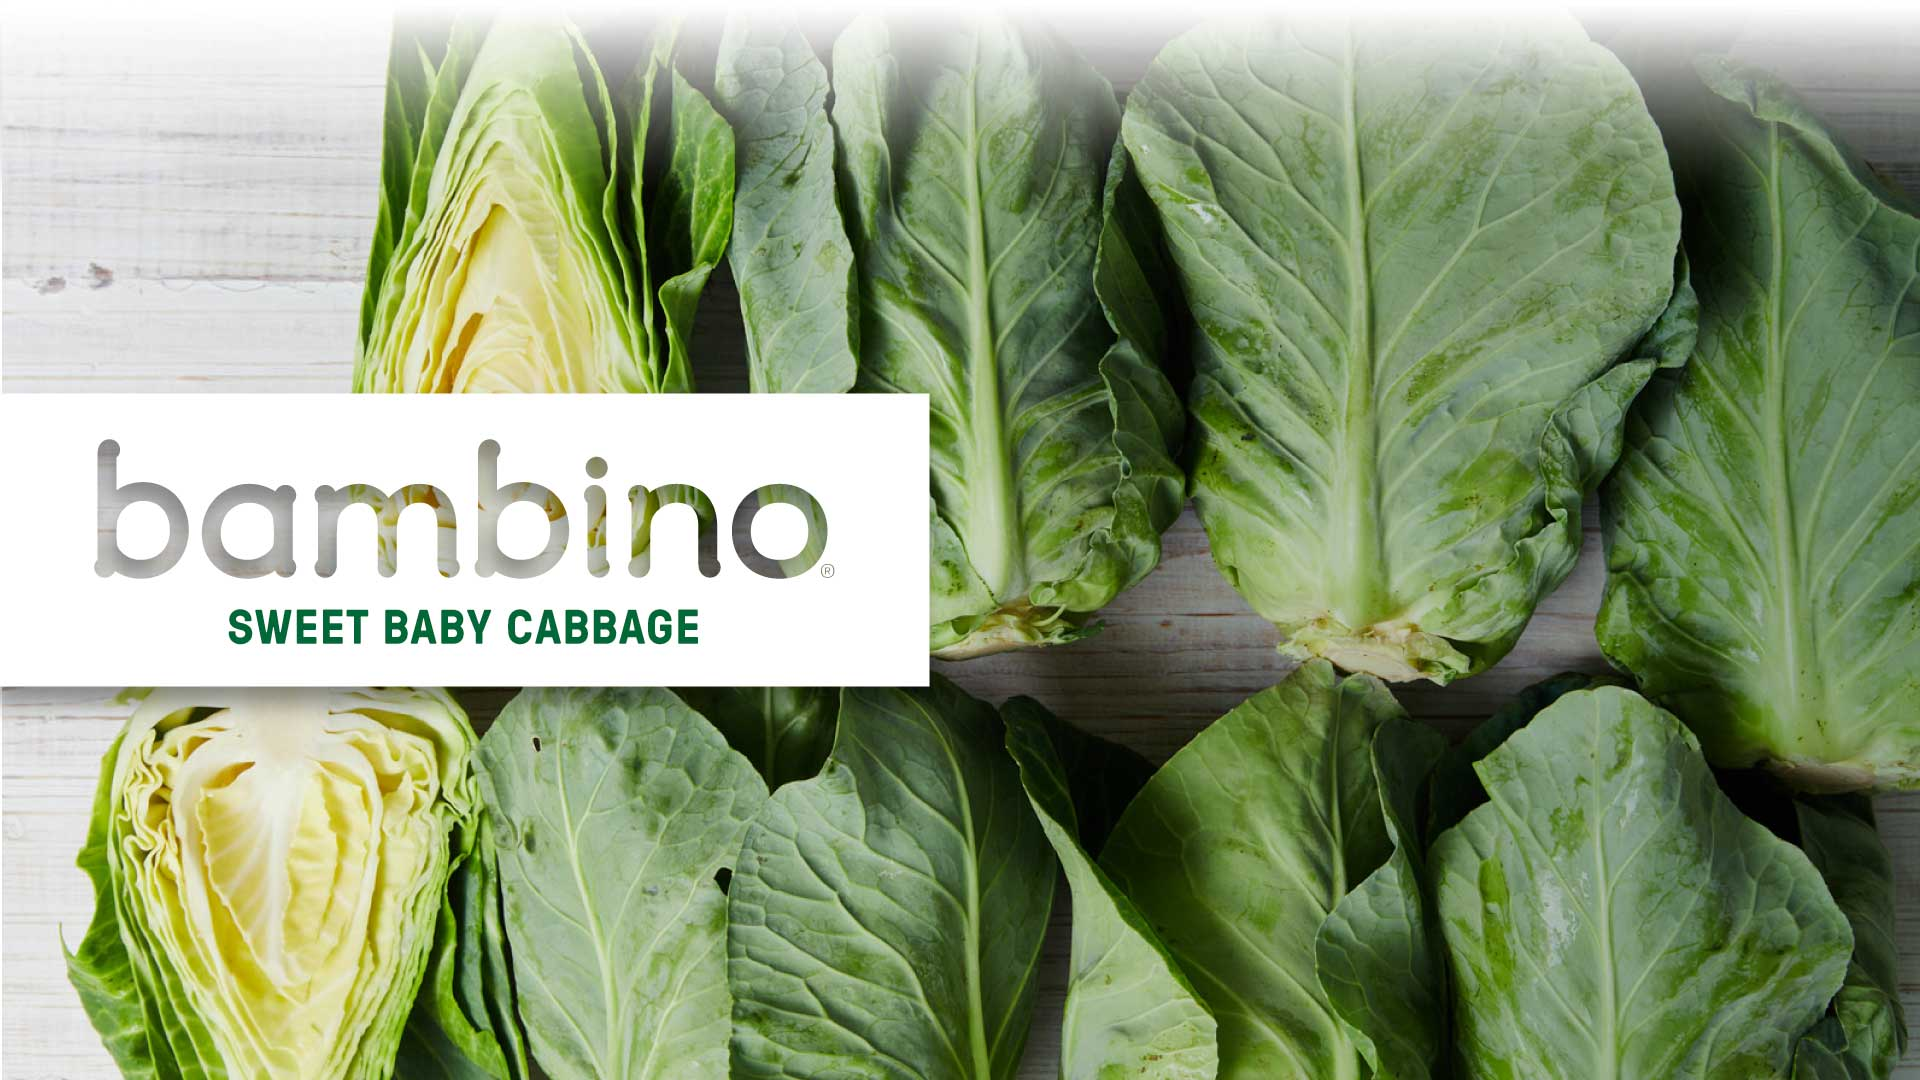 New! Bambino sweet baby cabbage